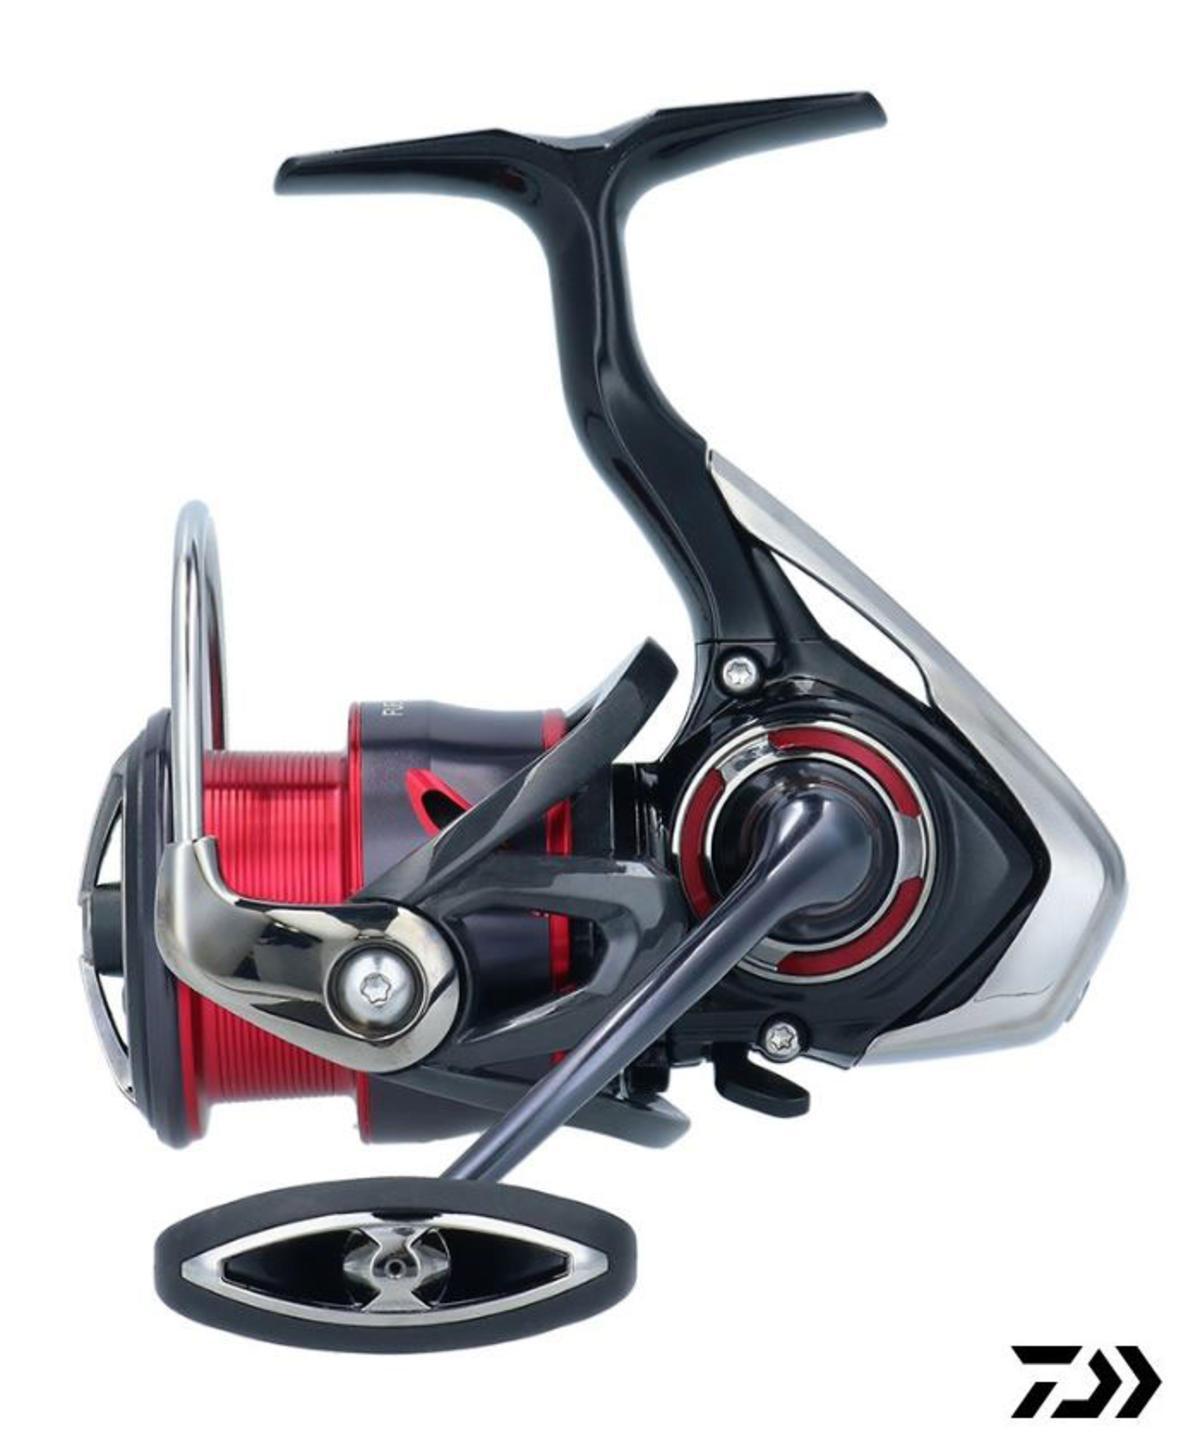 New Daiwa 20 Fuego LT Fishing Spinning Reels - All Sizes / Models